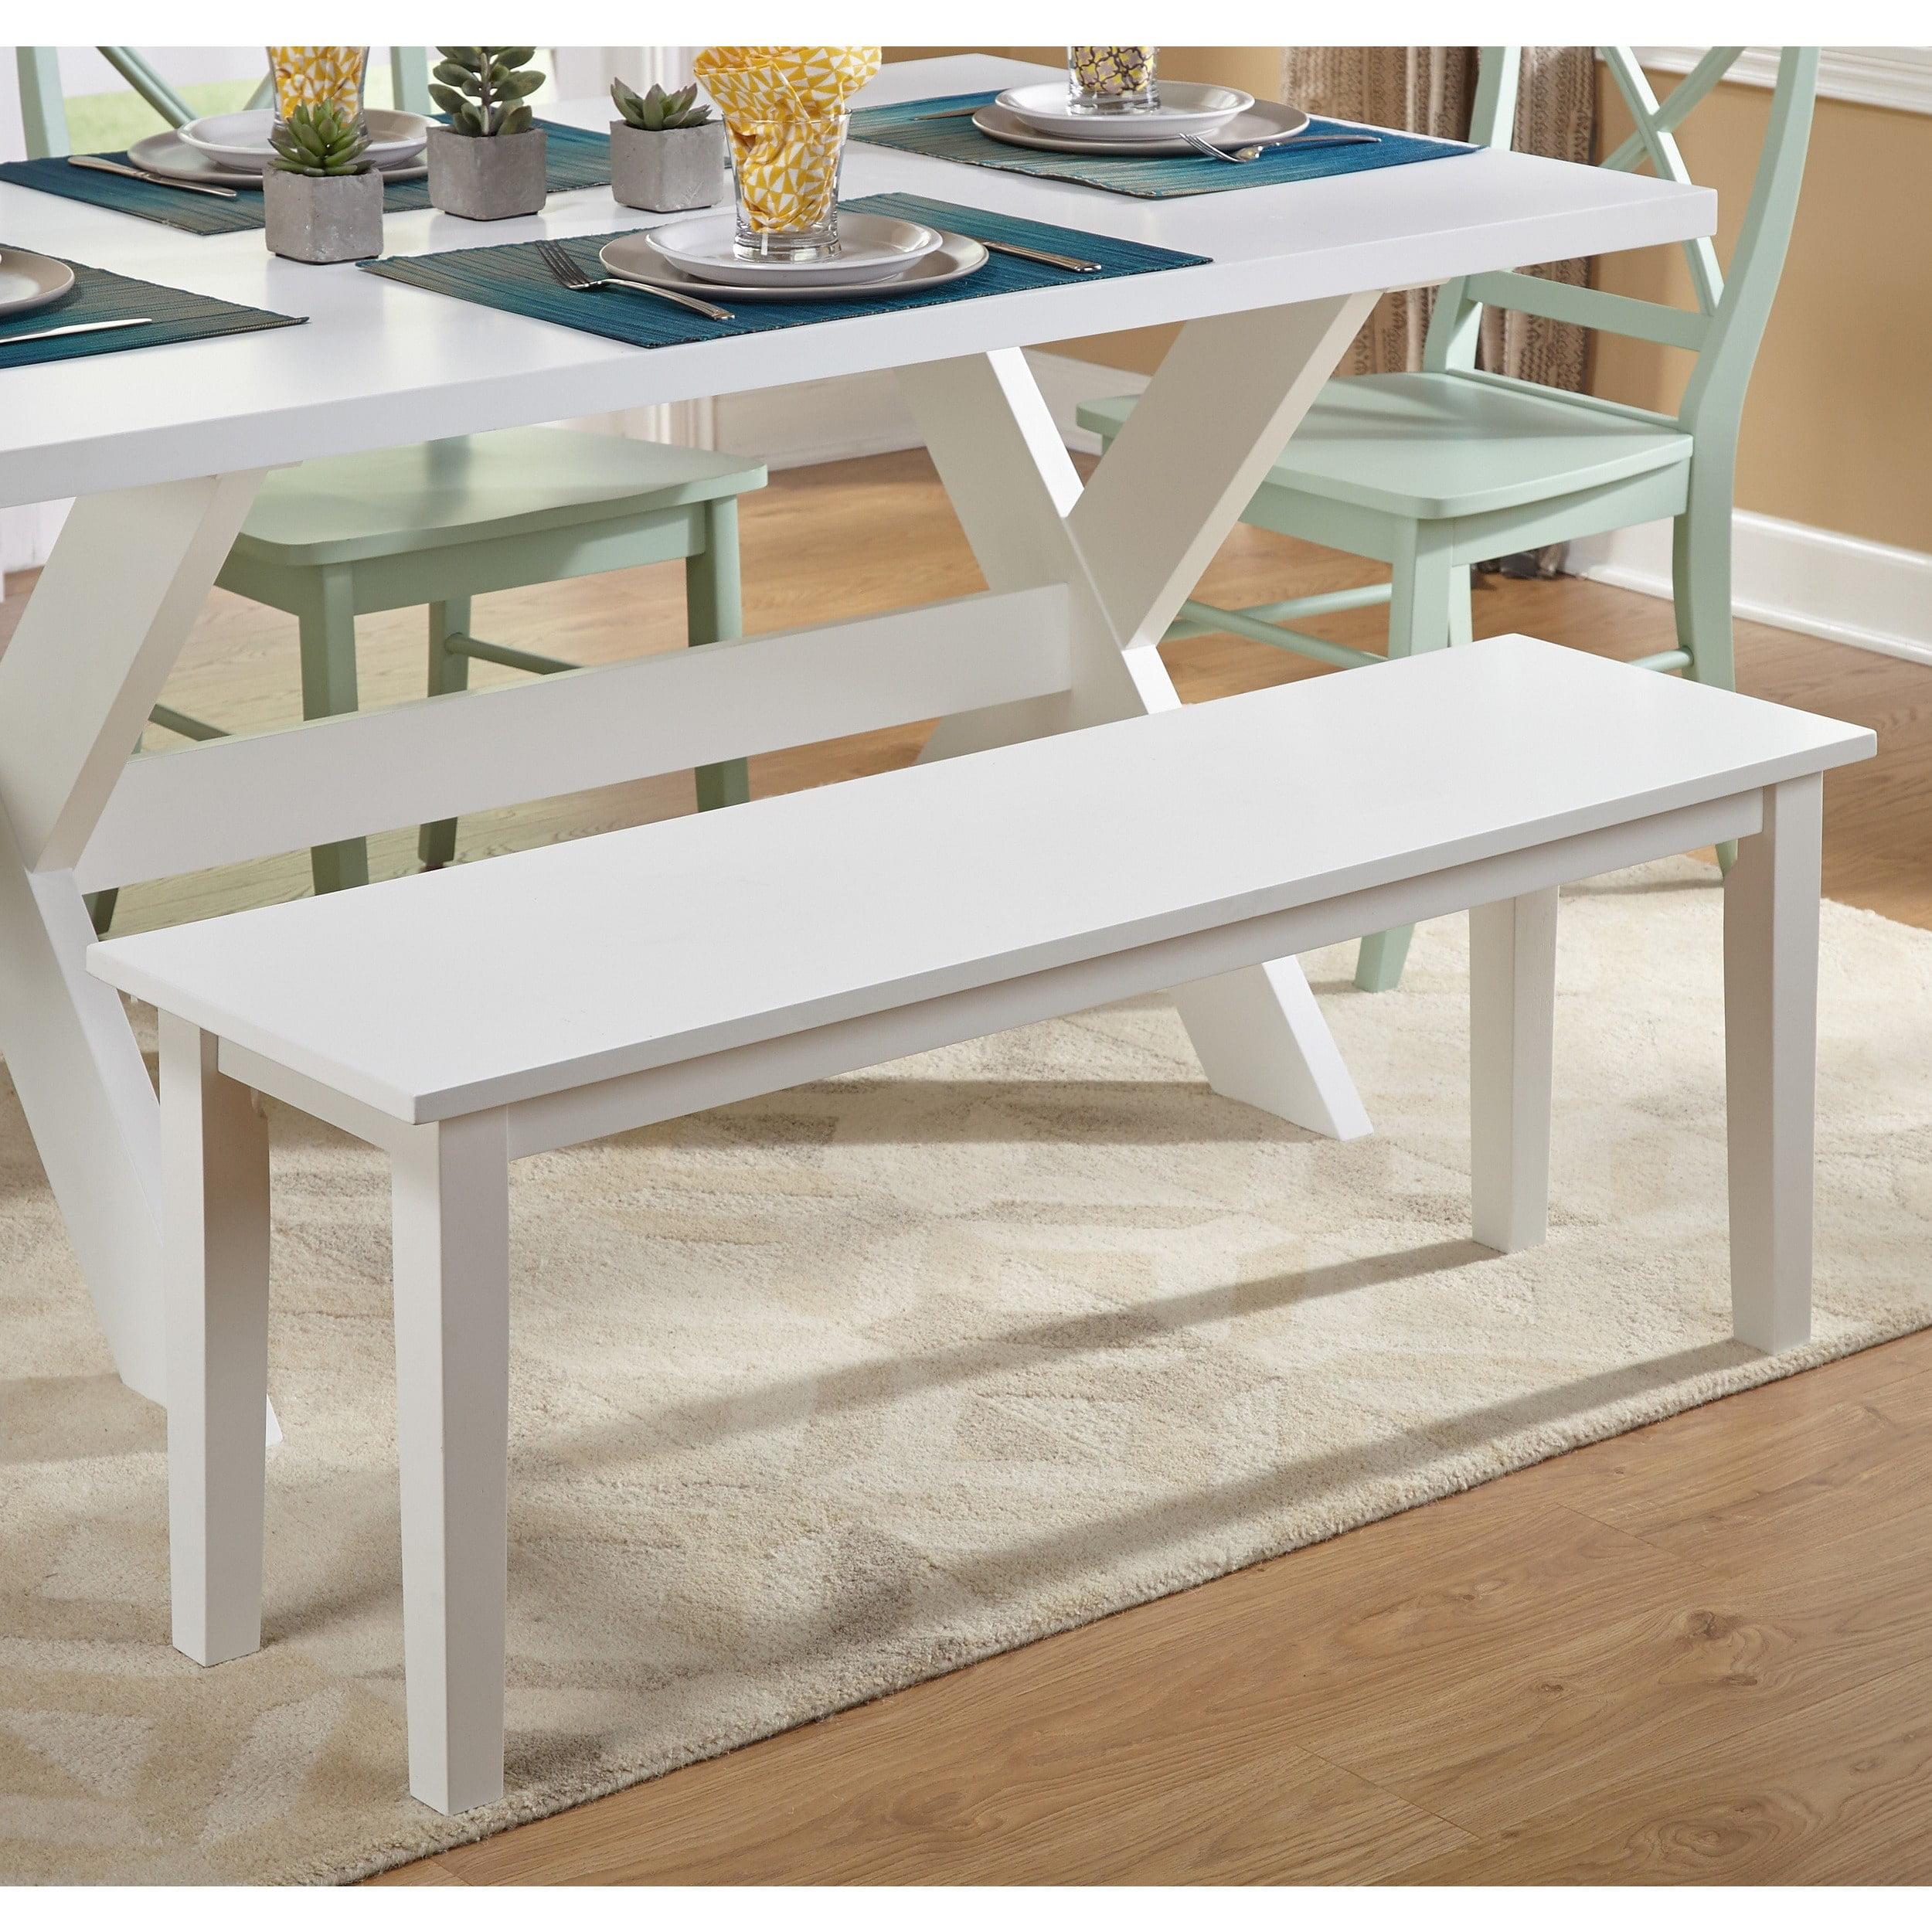 Dining Bench, White Finish - Walmart.com